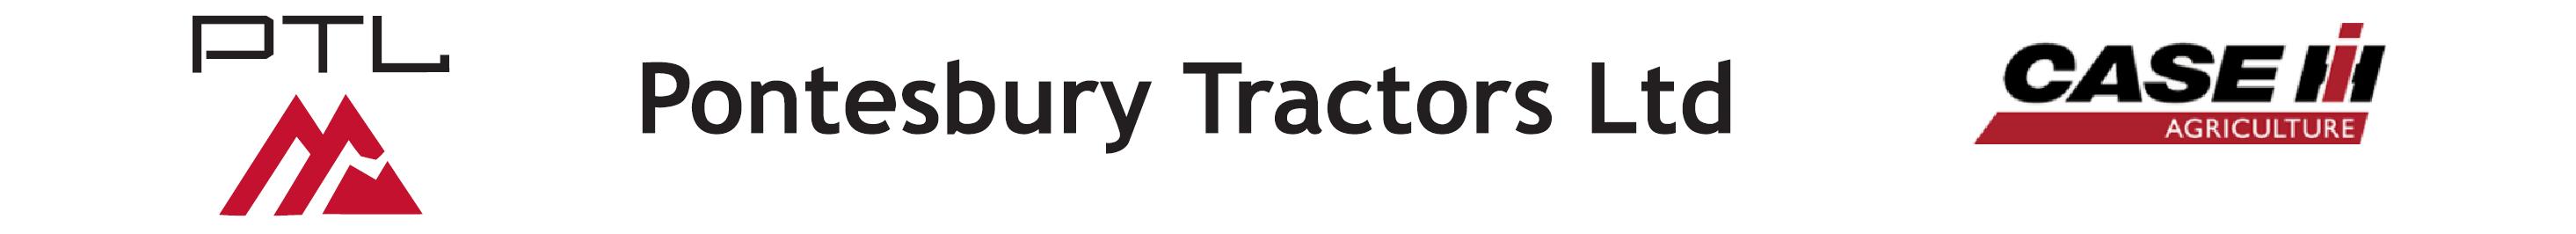 Pontesbury Tractors Ltd.